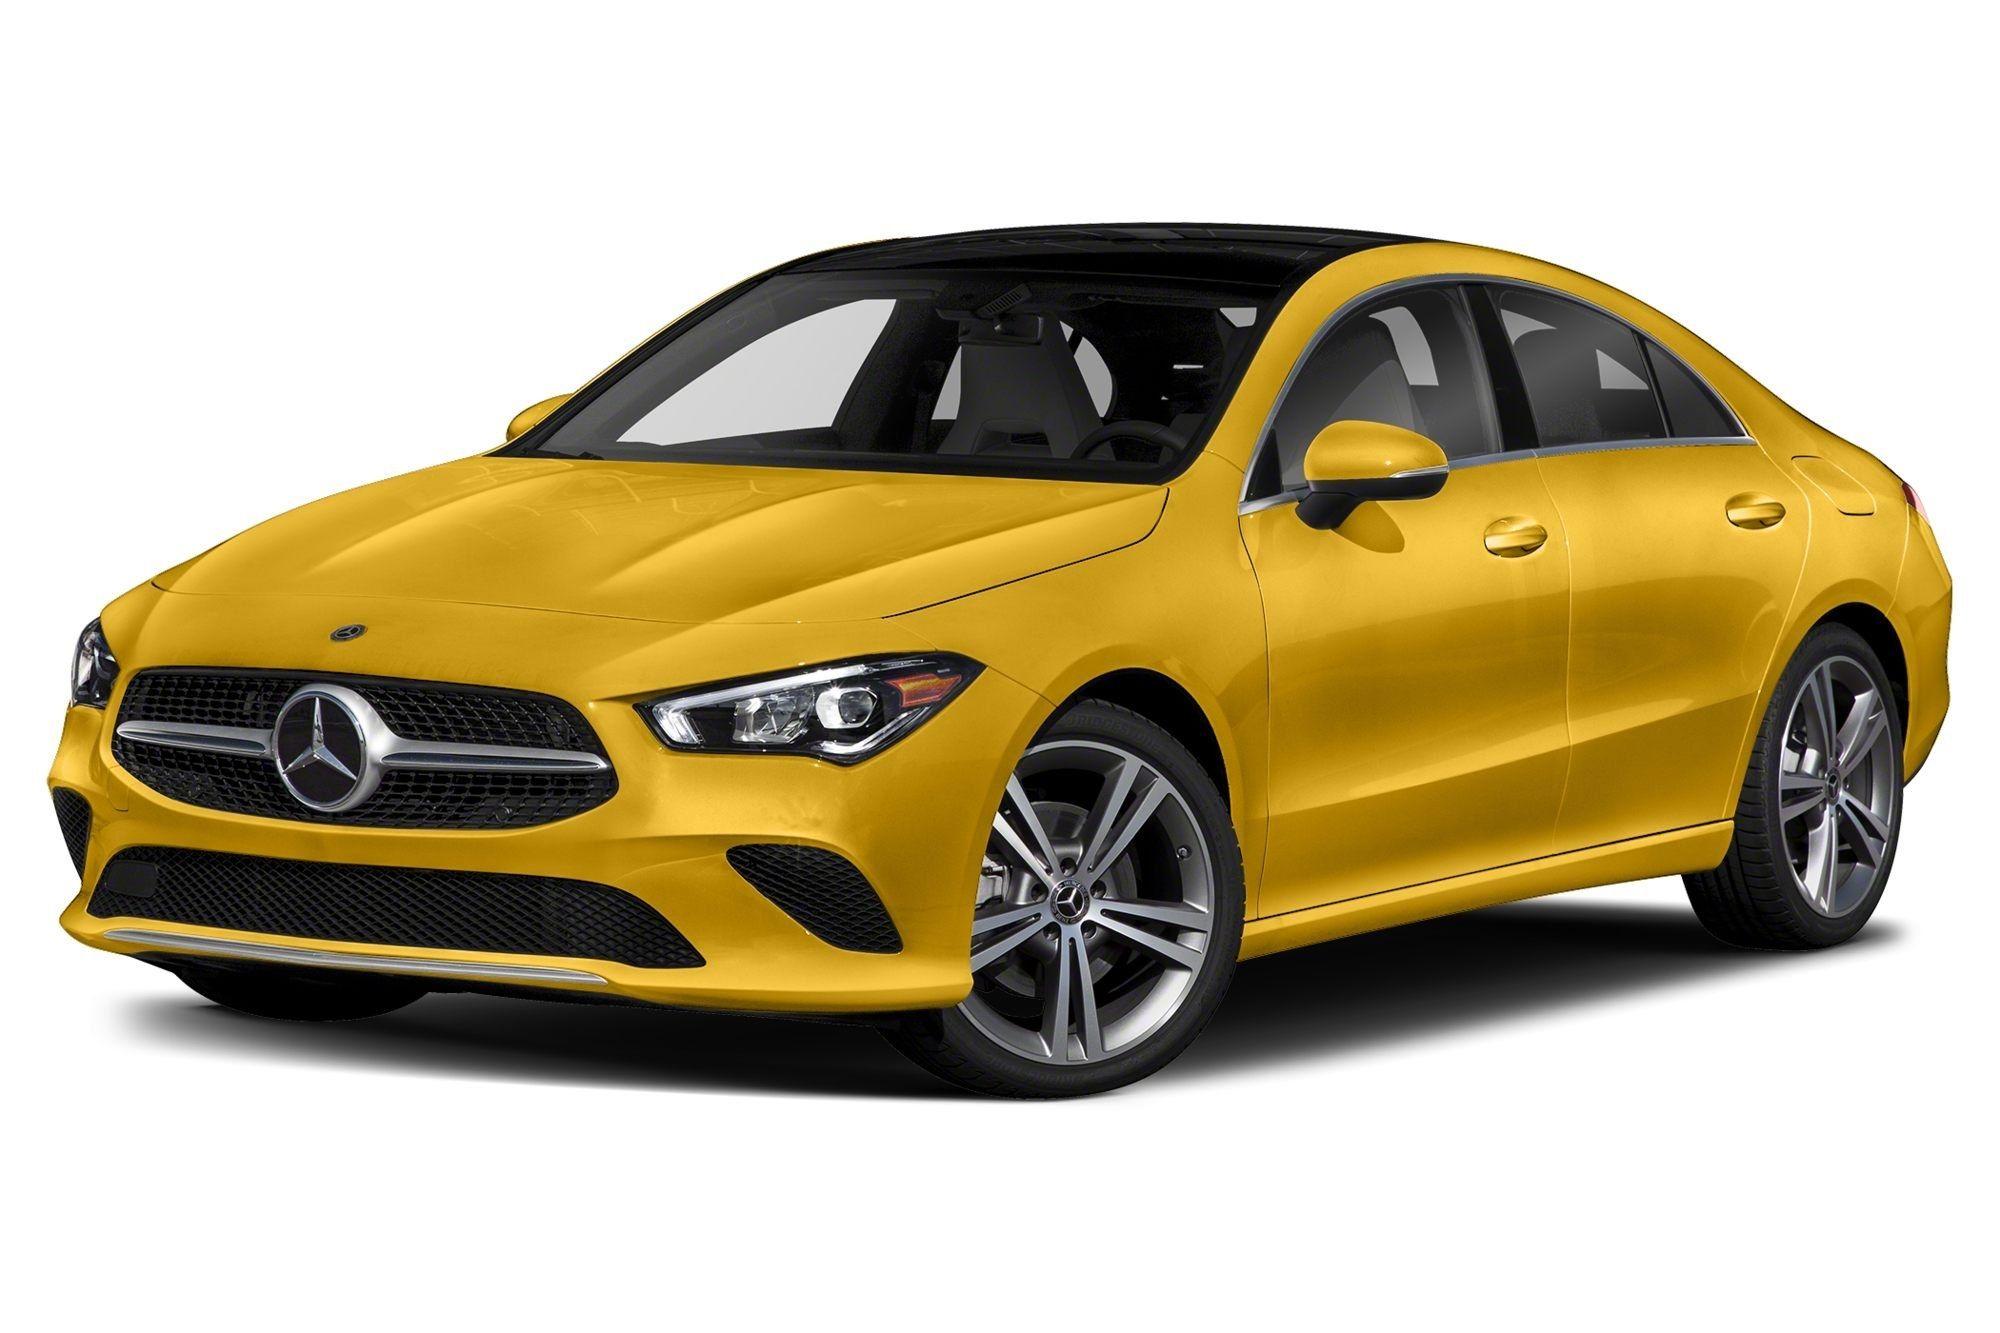 Mercedes Recall 2020 in 2020 Car, Mercedes, Sports cars